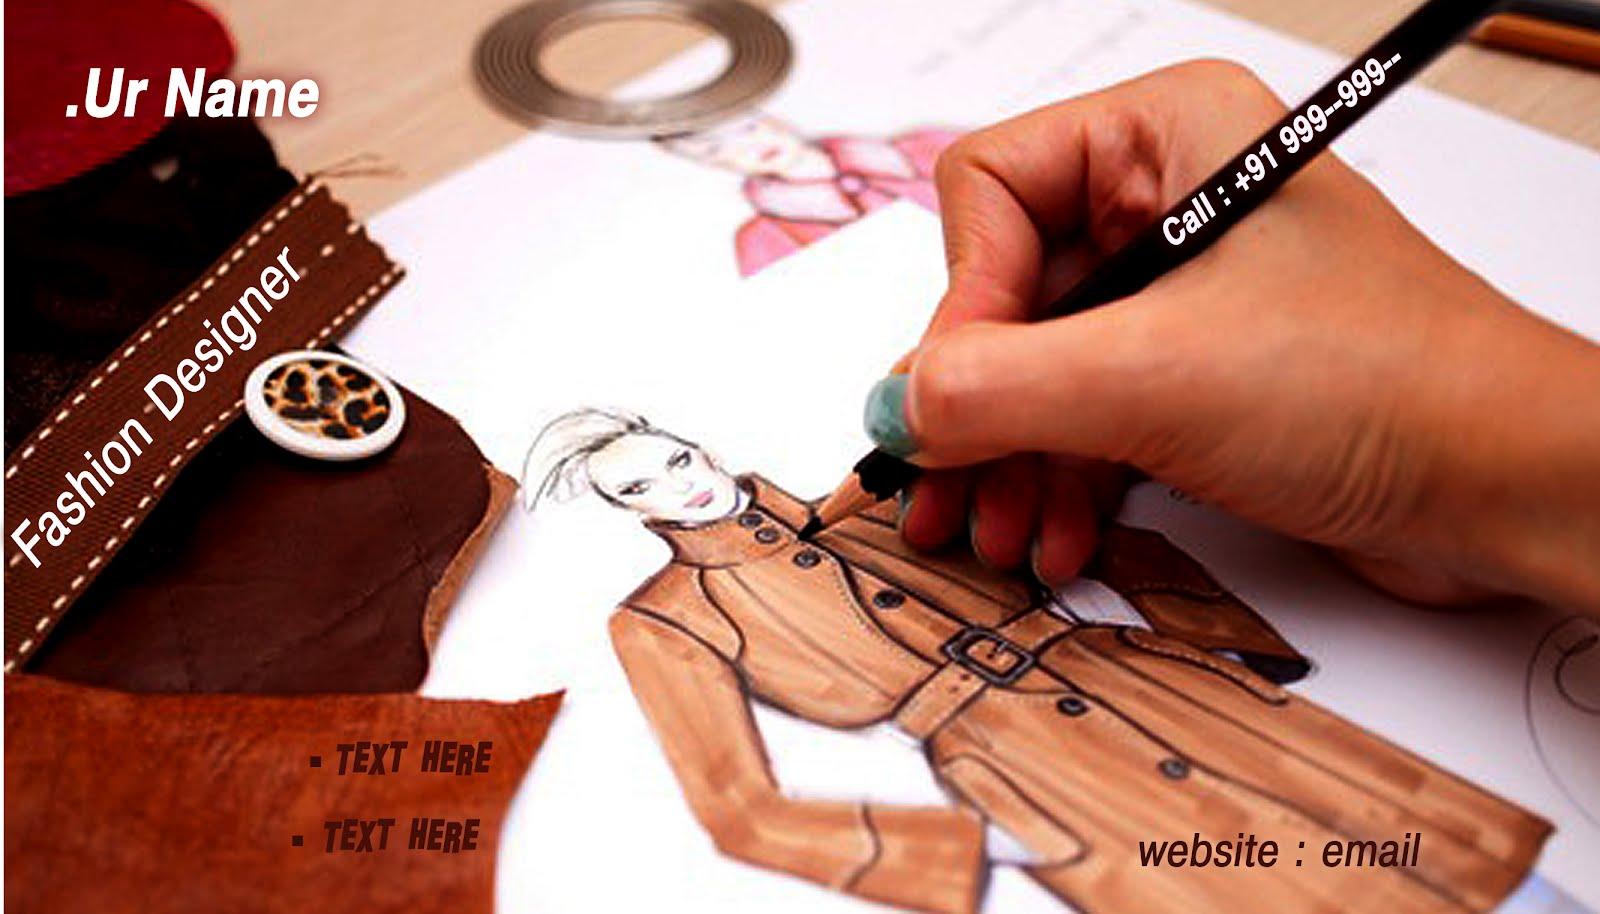 Business Card India Templates Design Free Download Uniq Visiting Cards Design India Fashion Designer Business Cards Design India Free Download Stylish Designs